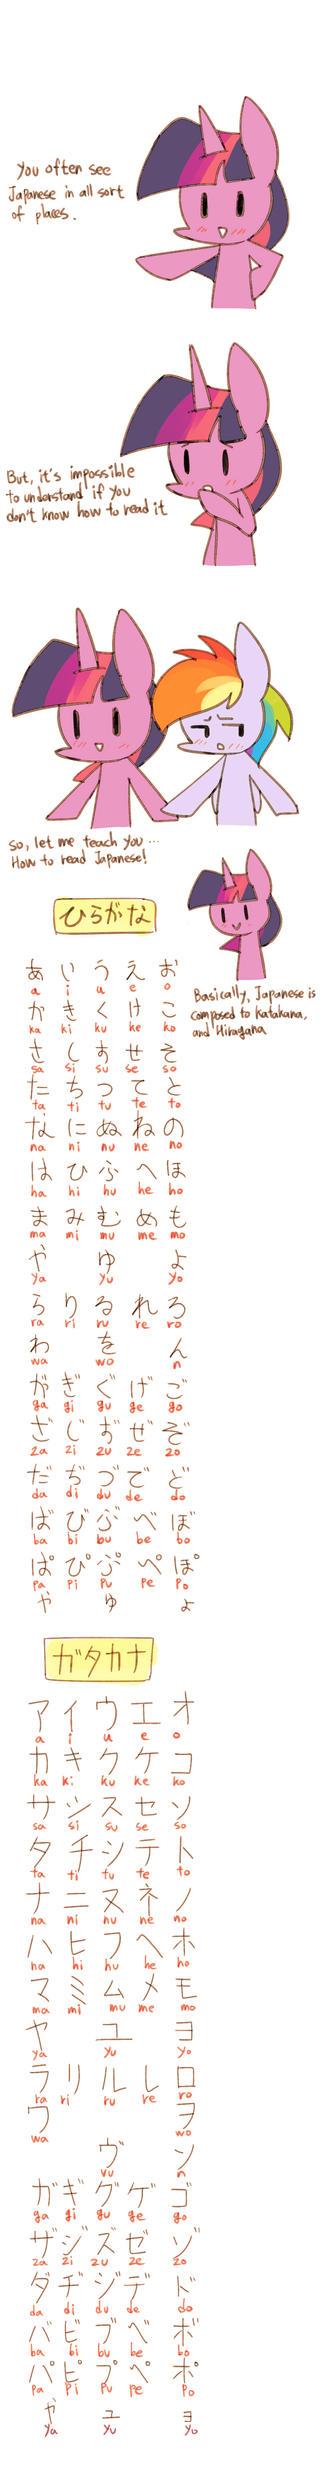 Hi, Japanese by joycall3